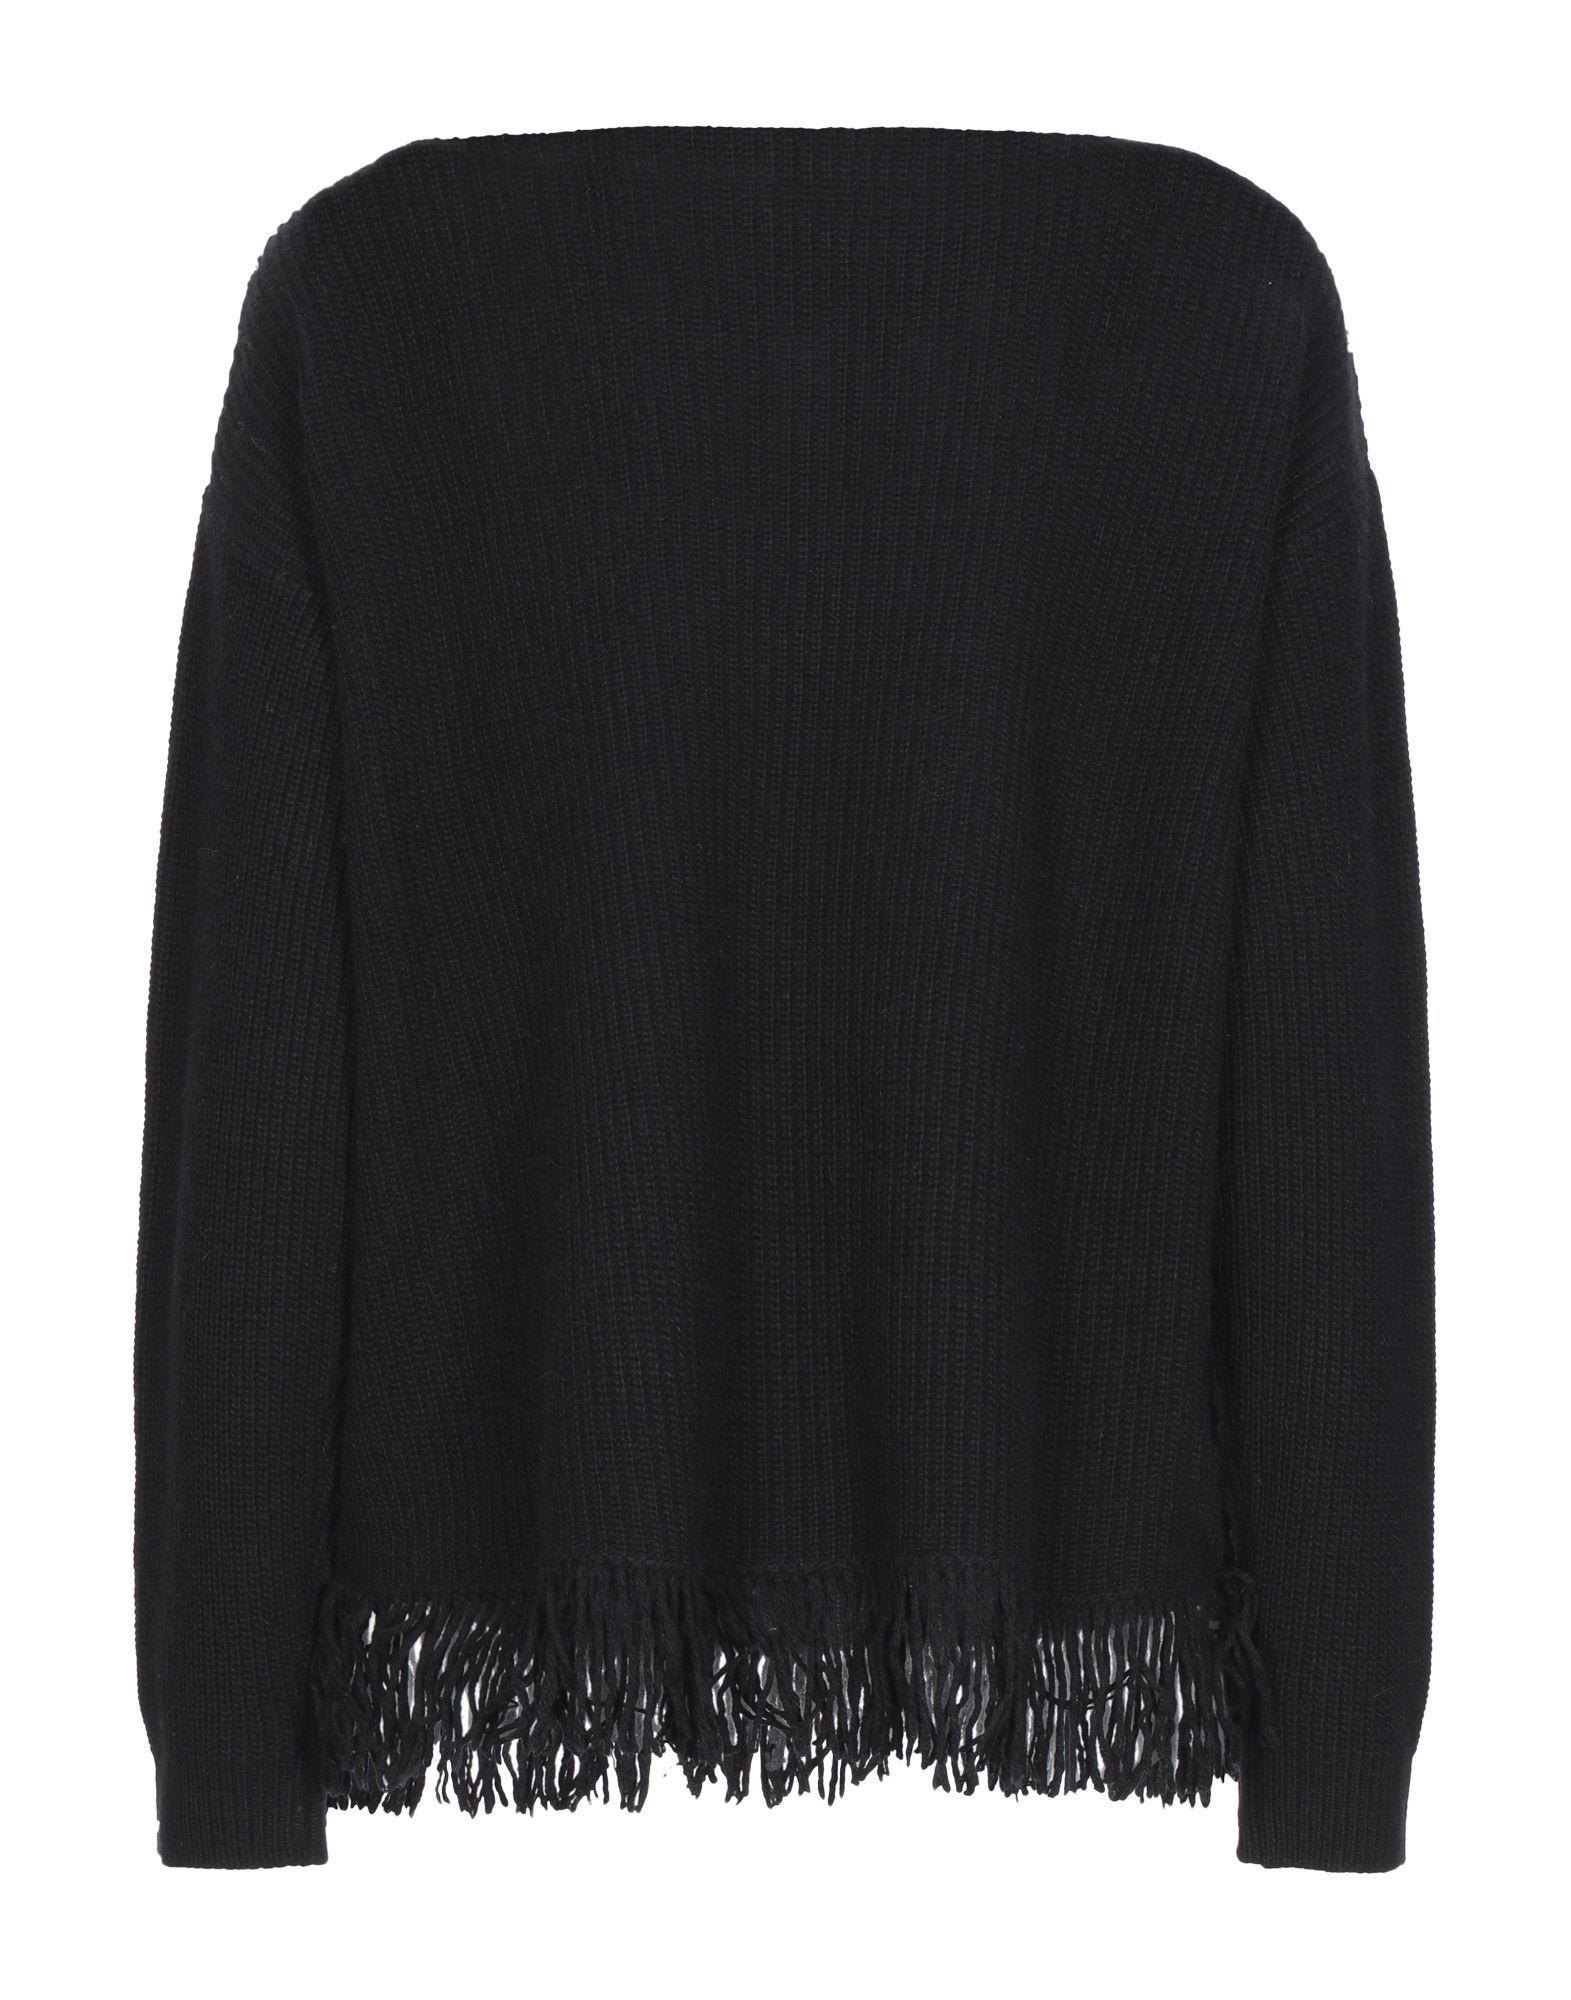 Kaos Black Sequin Knit Jumper